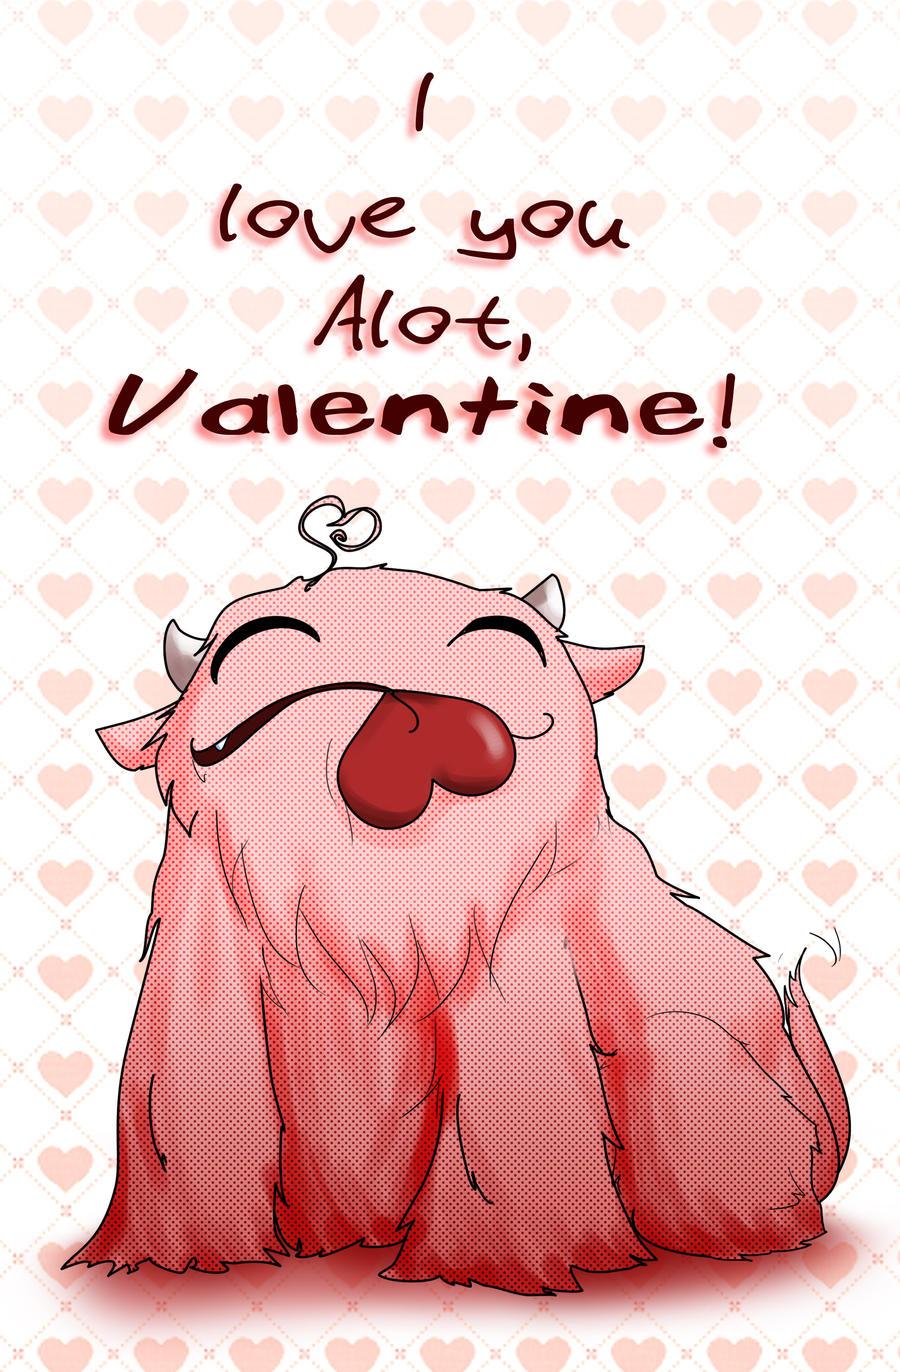 Valentine, Alot by sylvacoer